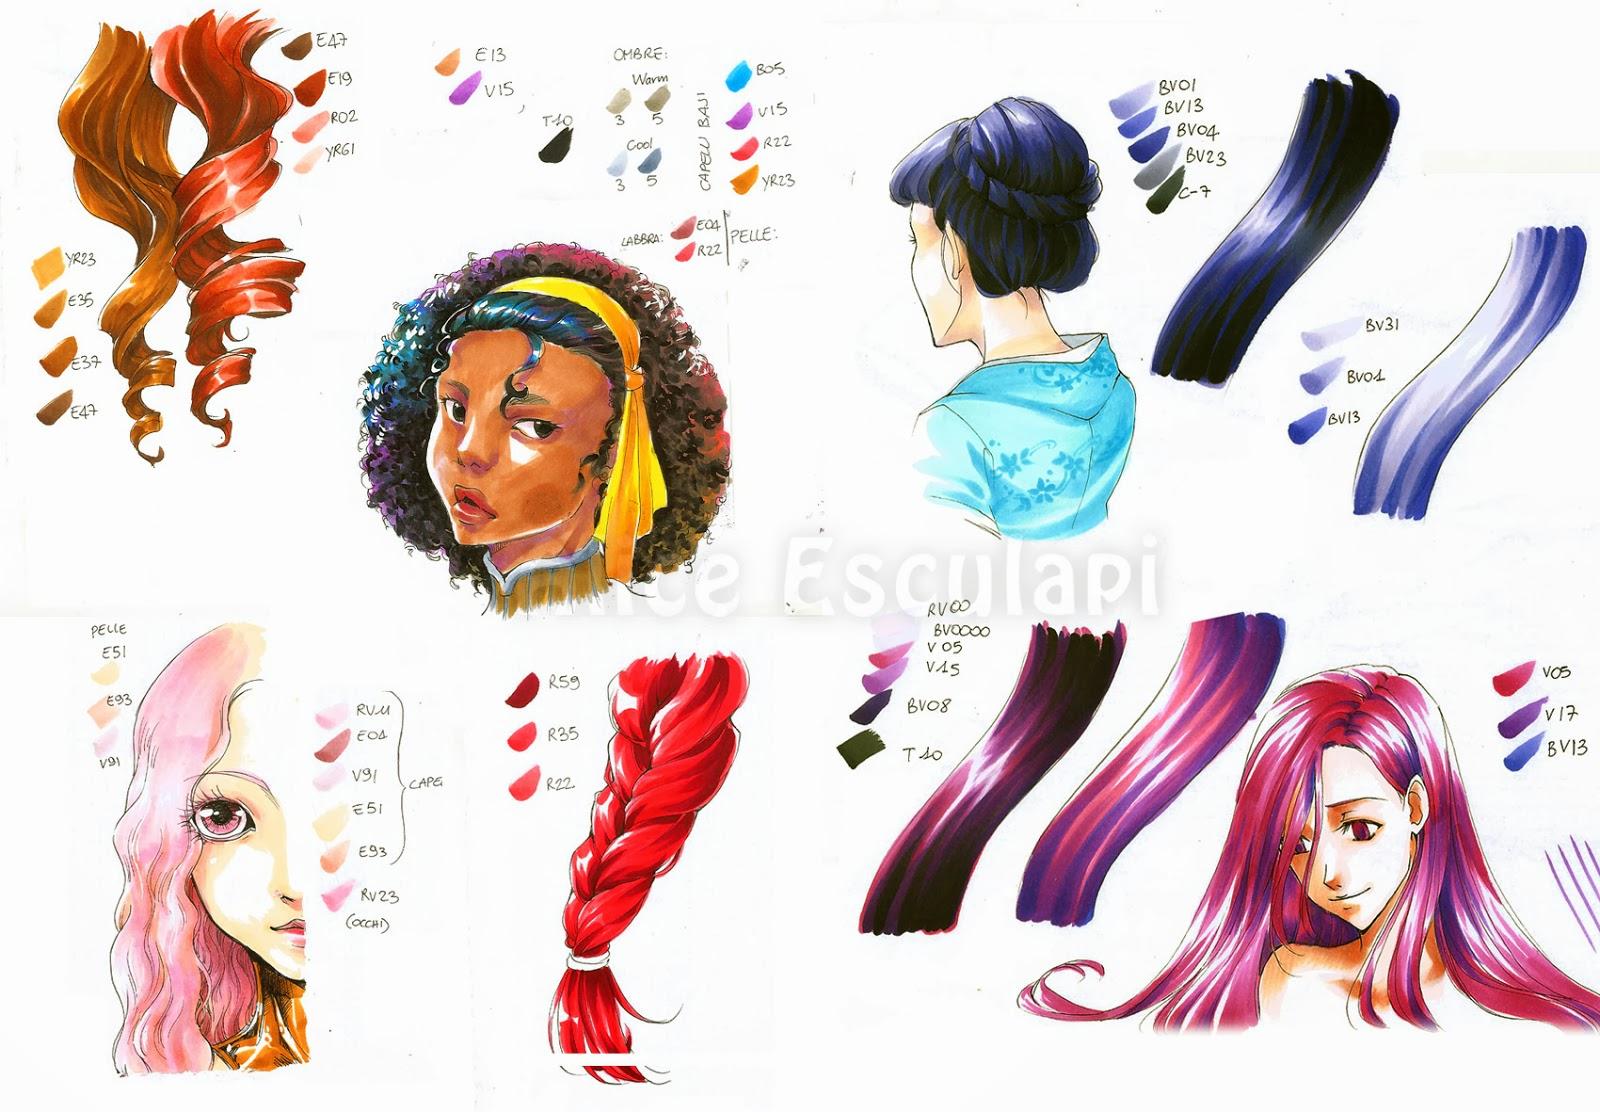 cheap huge selection of the best Copic Italia: Tutorial: come colorare i capelli in stile ...